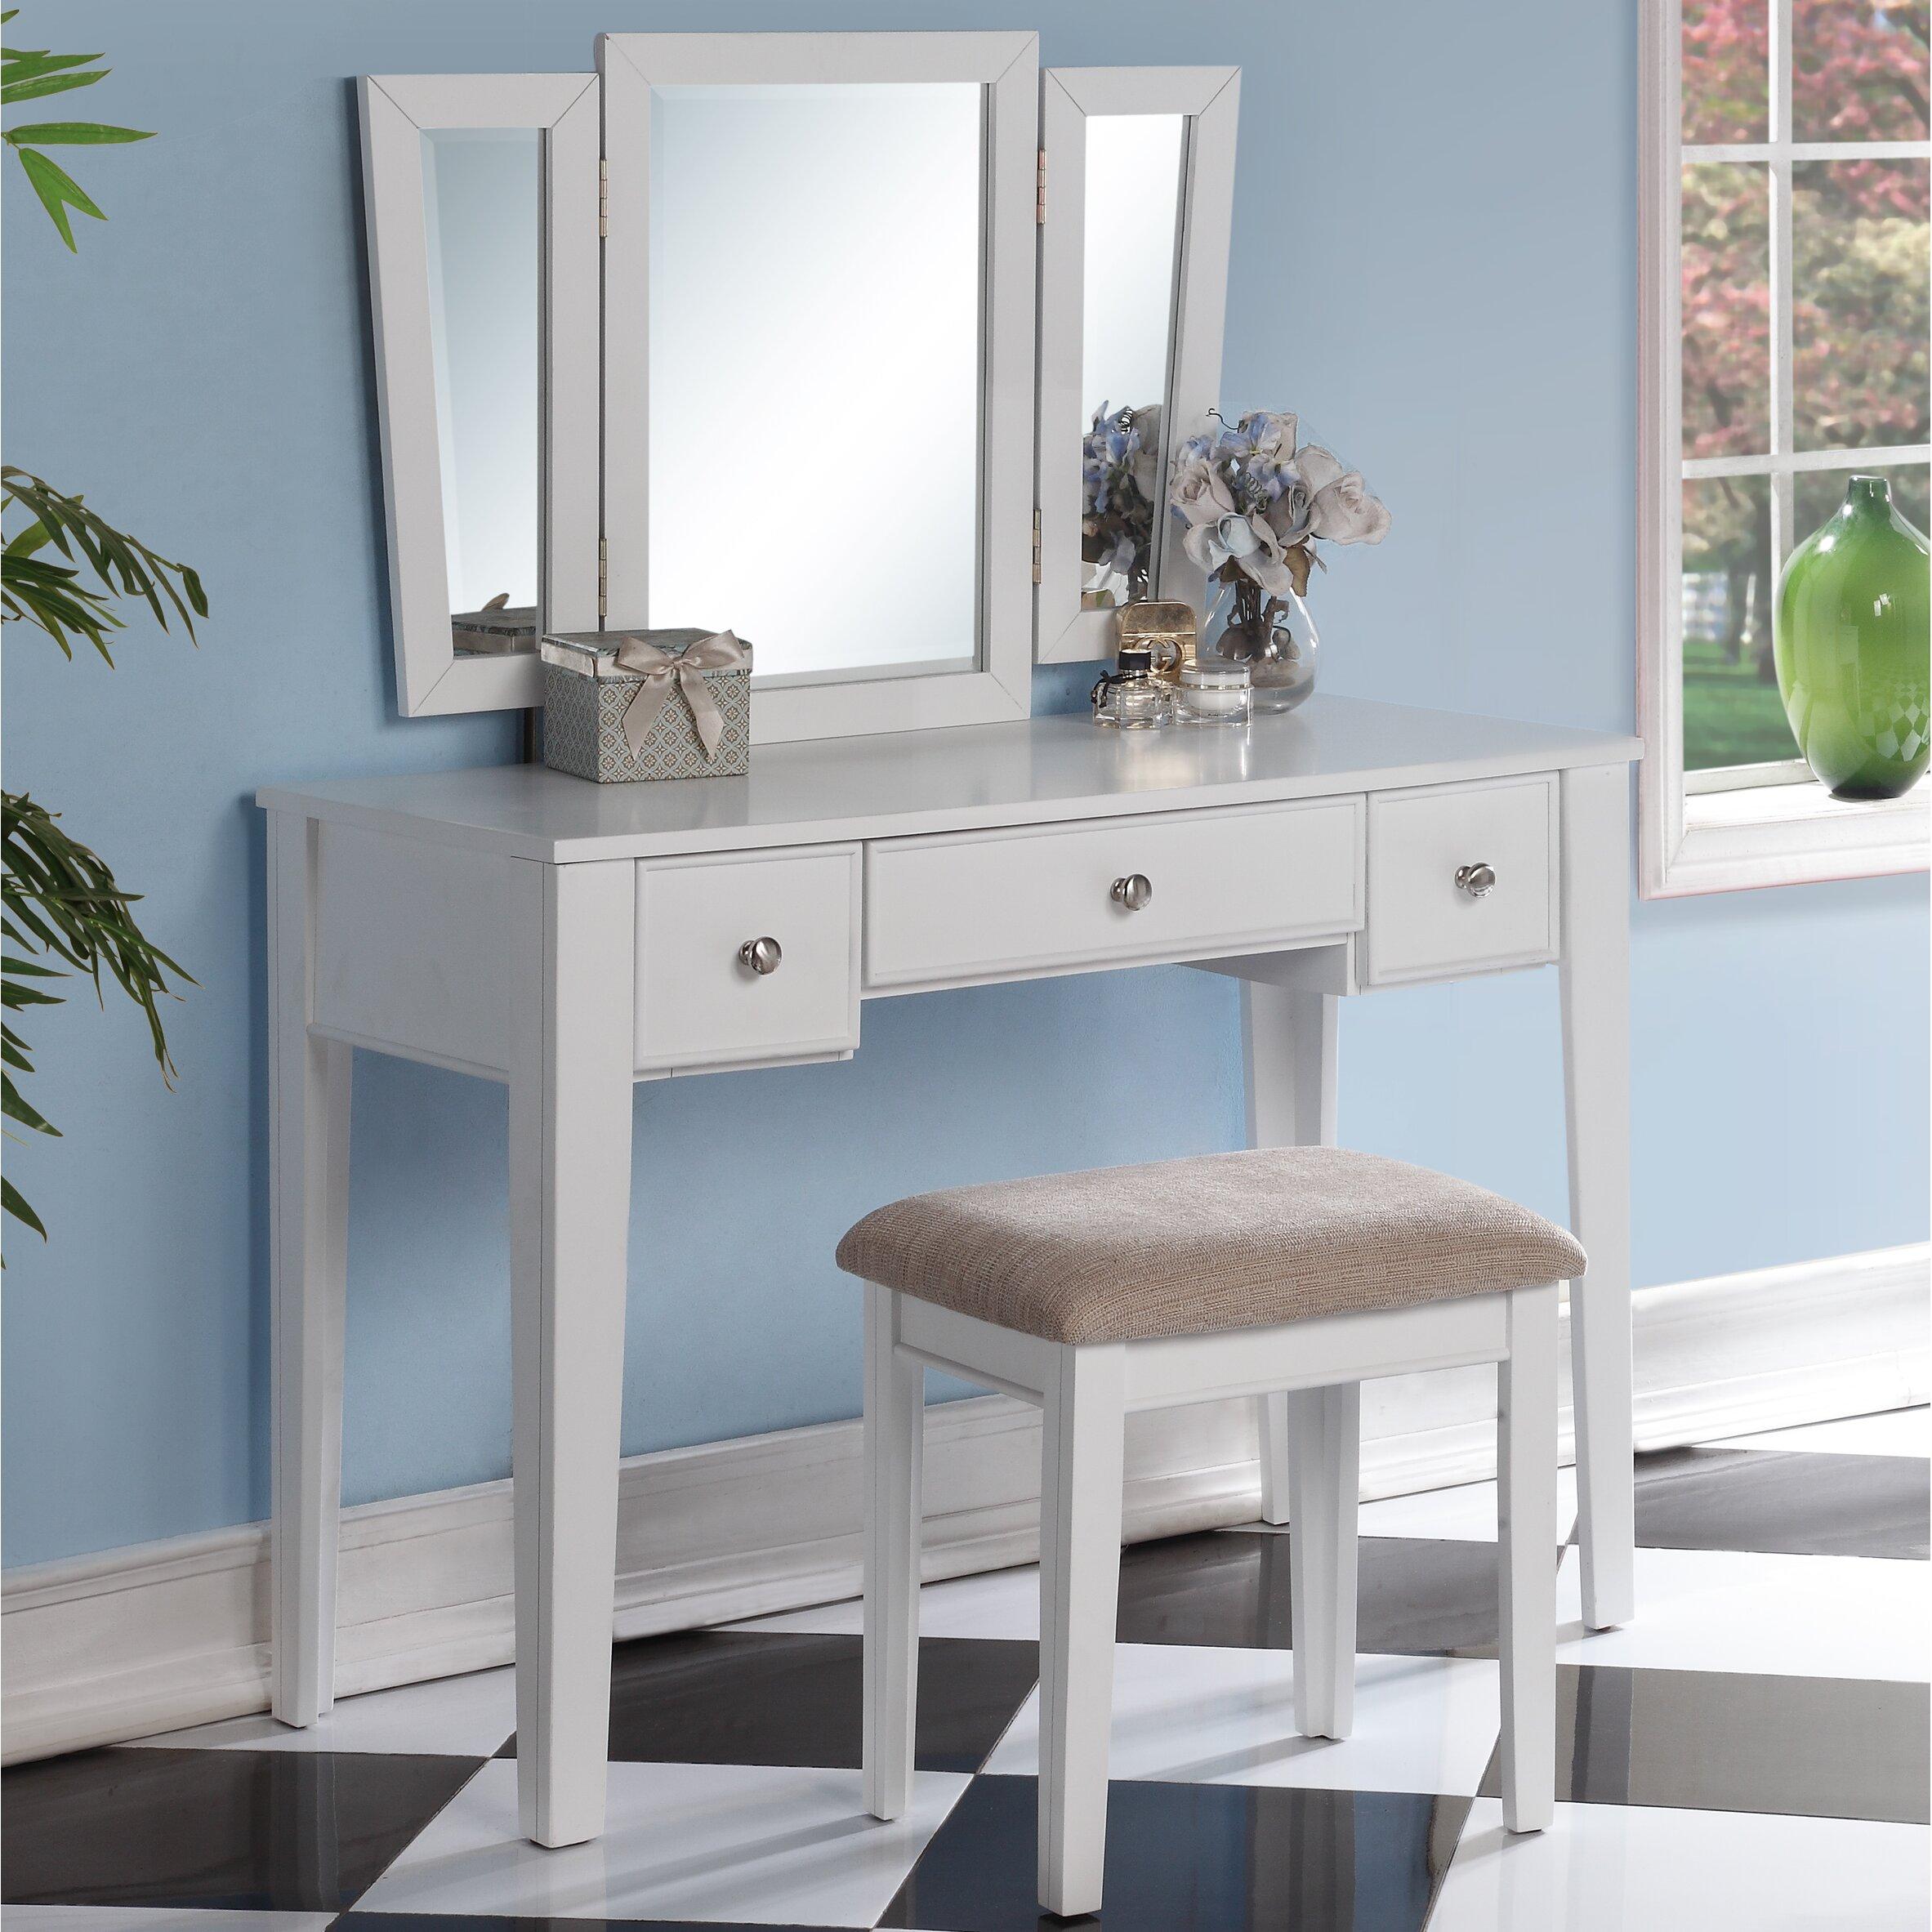 Poundex Bobkona Adar Vanity Set with Mirror. Poundex Bobkona Adar Vanity Set with Mirror   Reviews   Wayfair